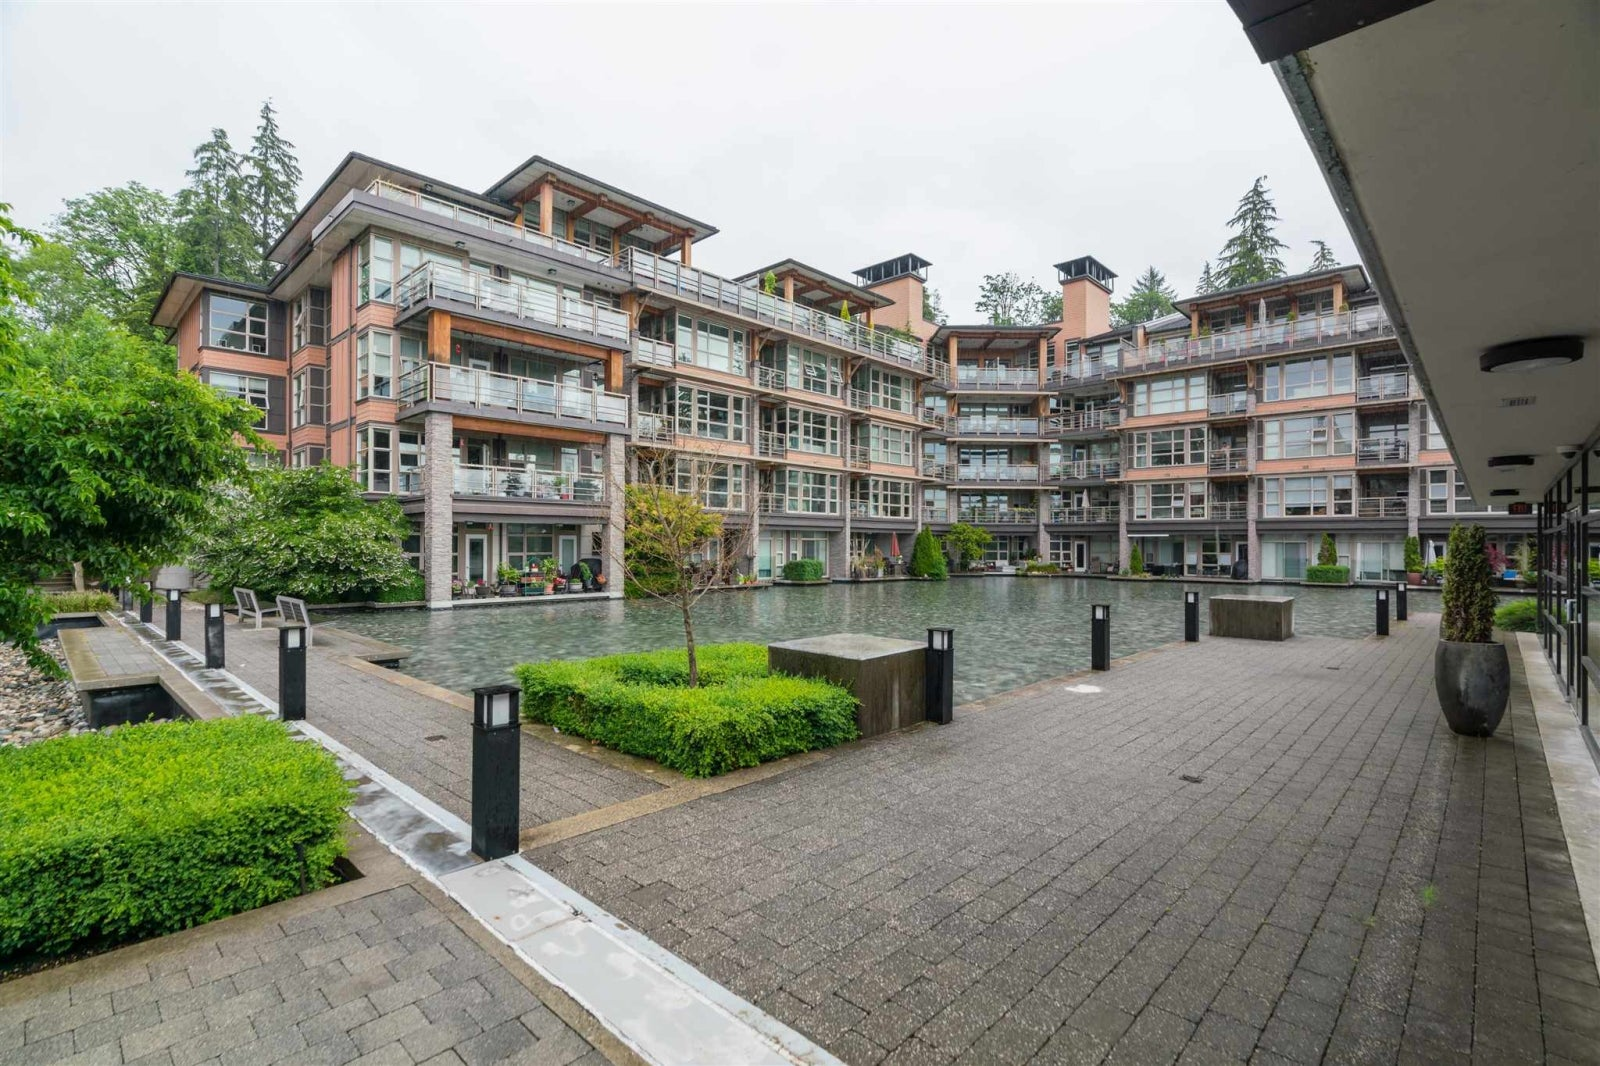 222 3602 ALDERCREST DRIVE - Roche Point Apartment/Condo for sale, 2 Bedrooms (R2603975) #1